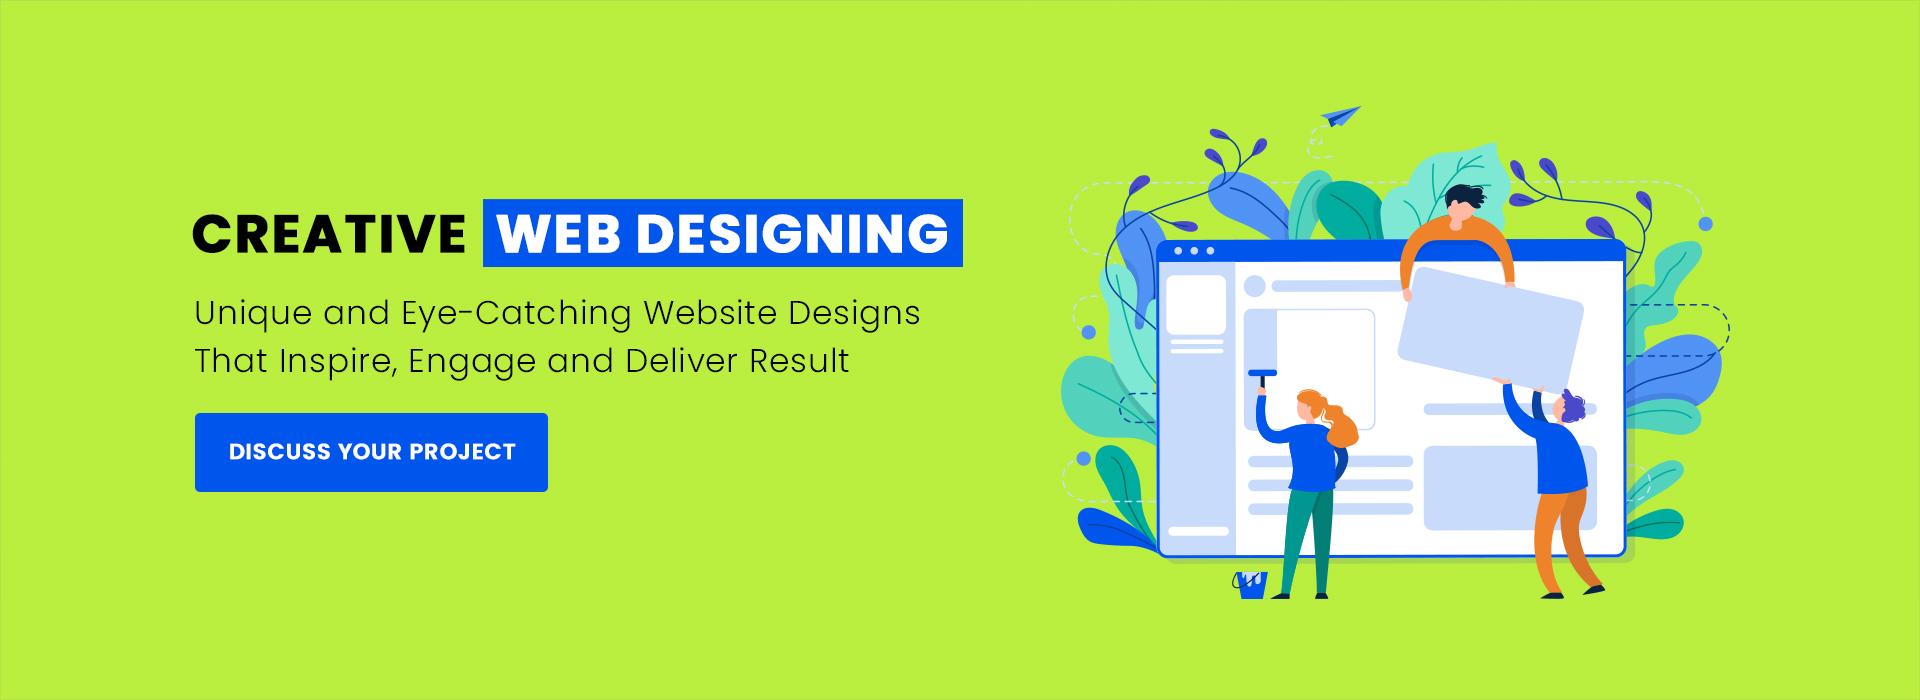 ragasoft solution web design banner